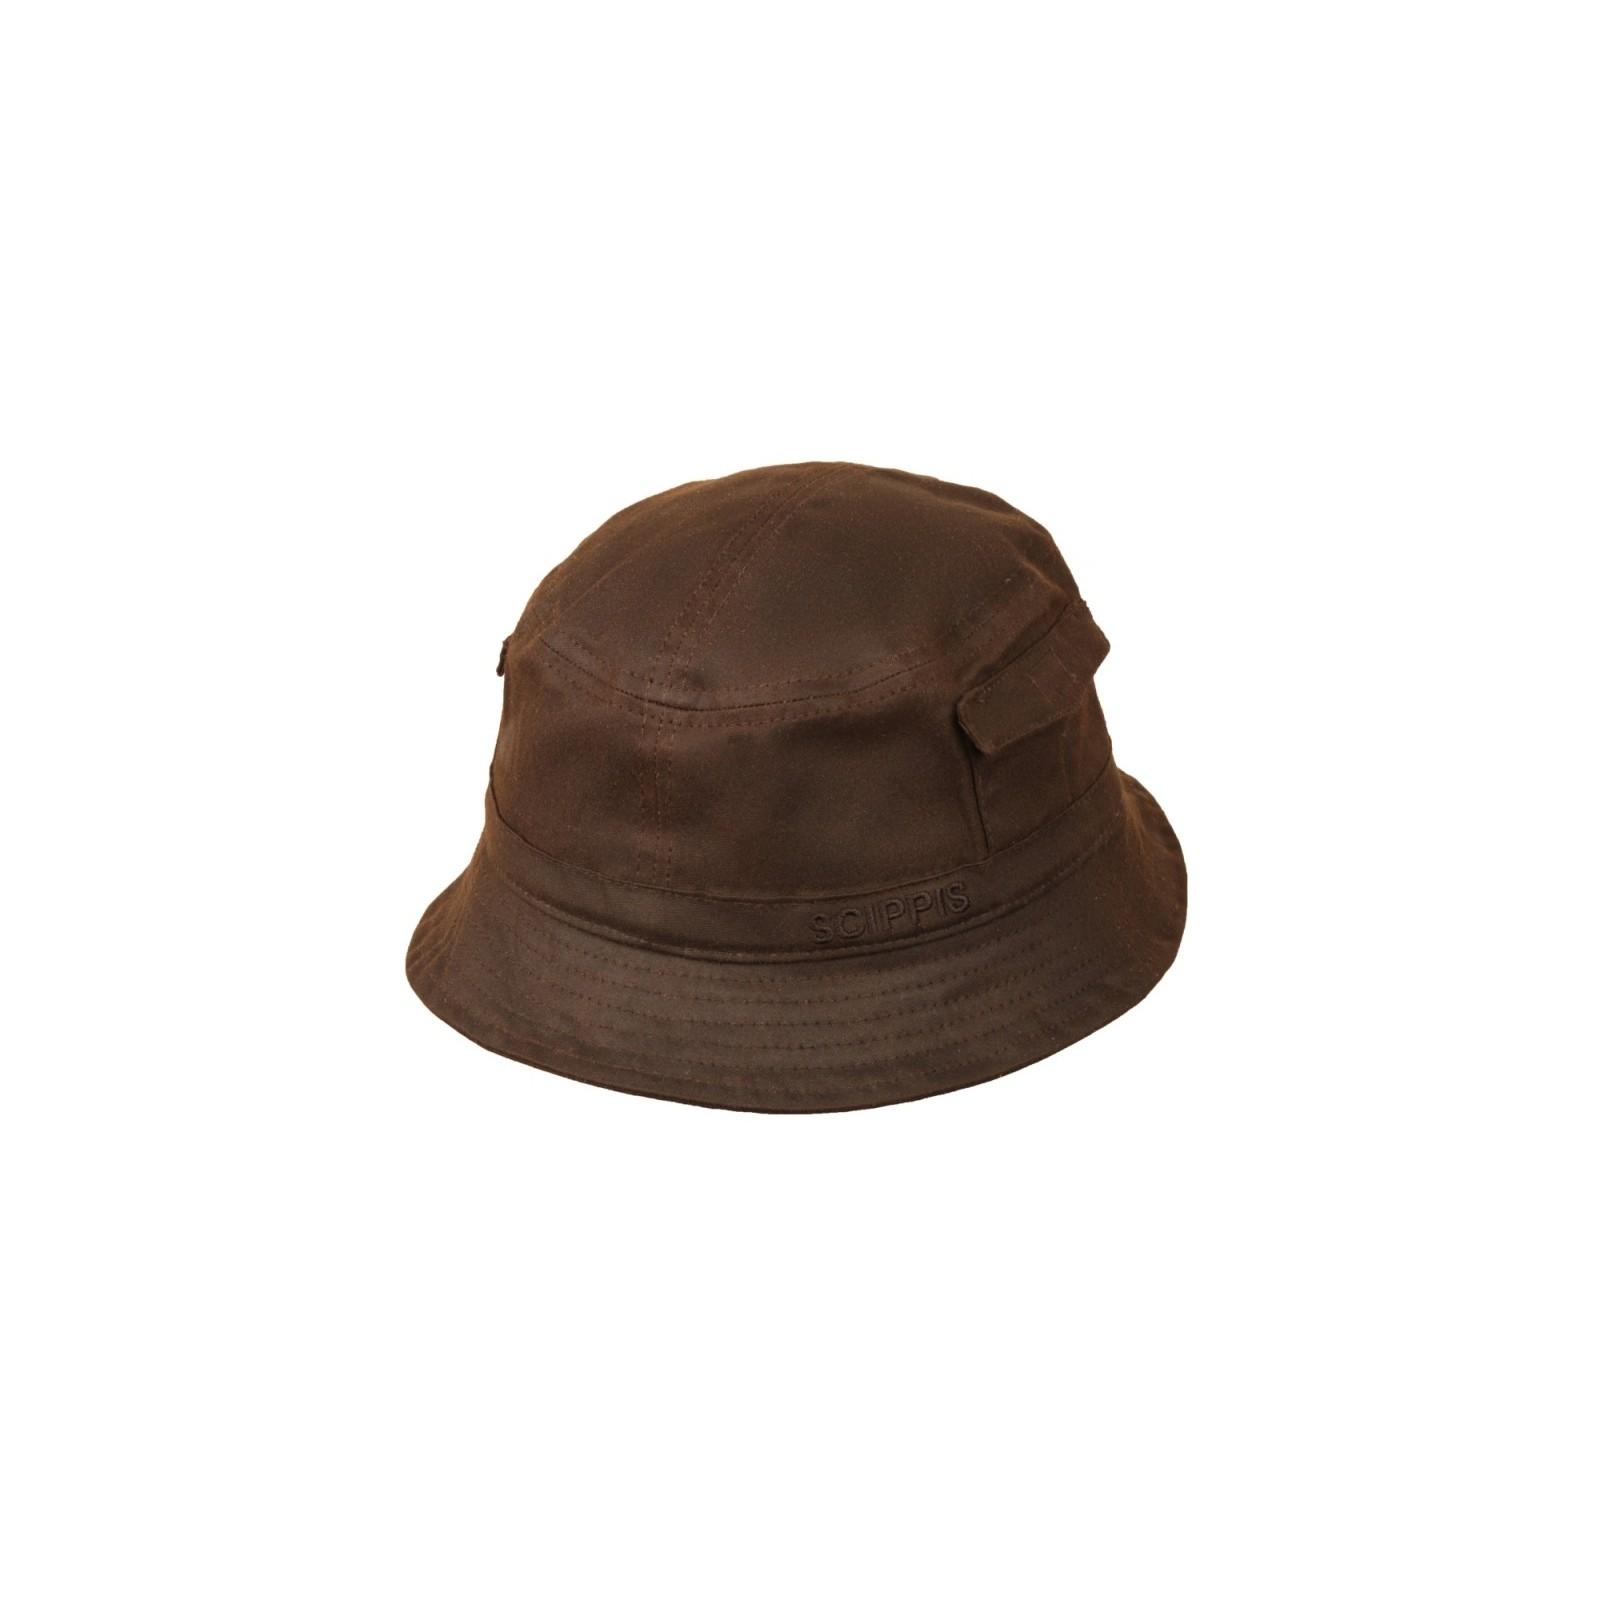 Scippis Riverman hat